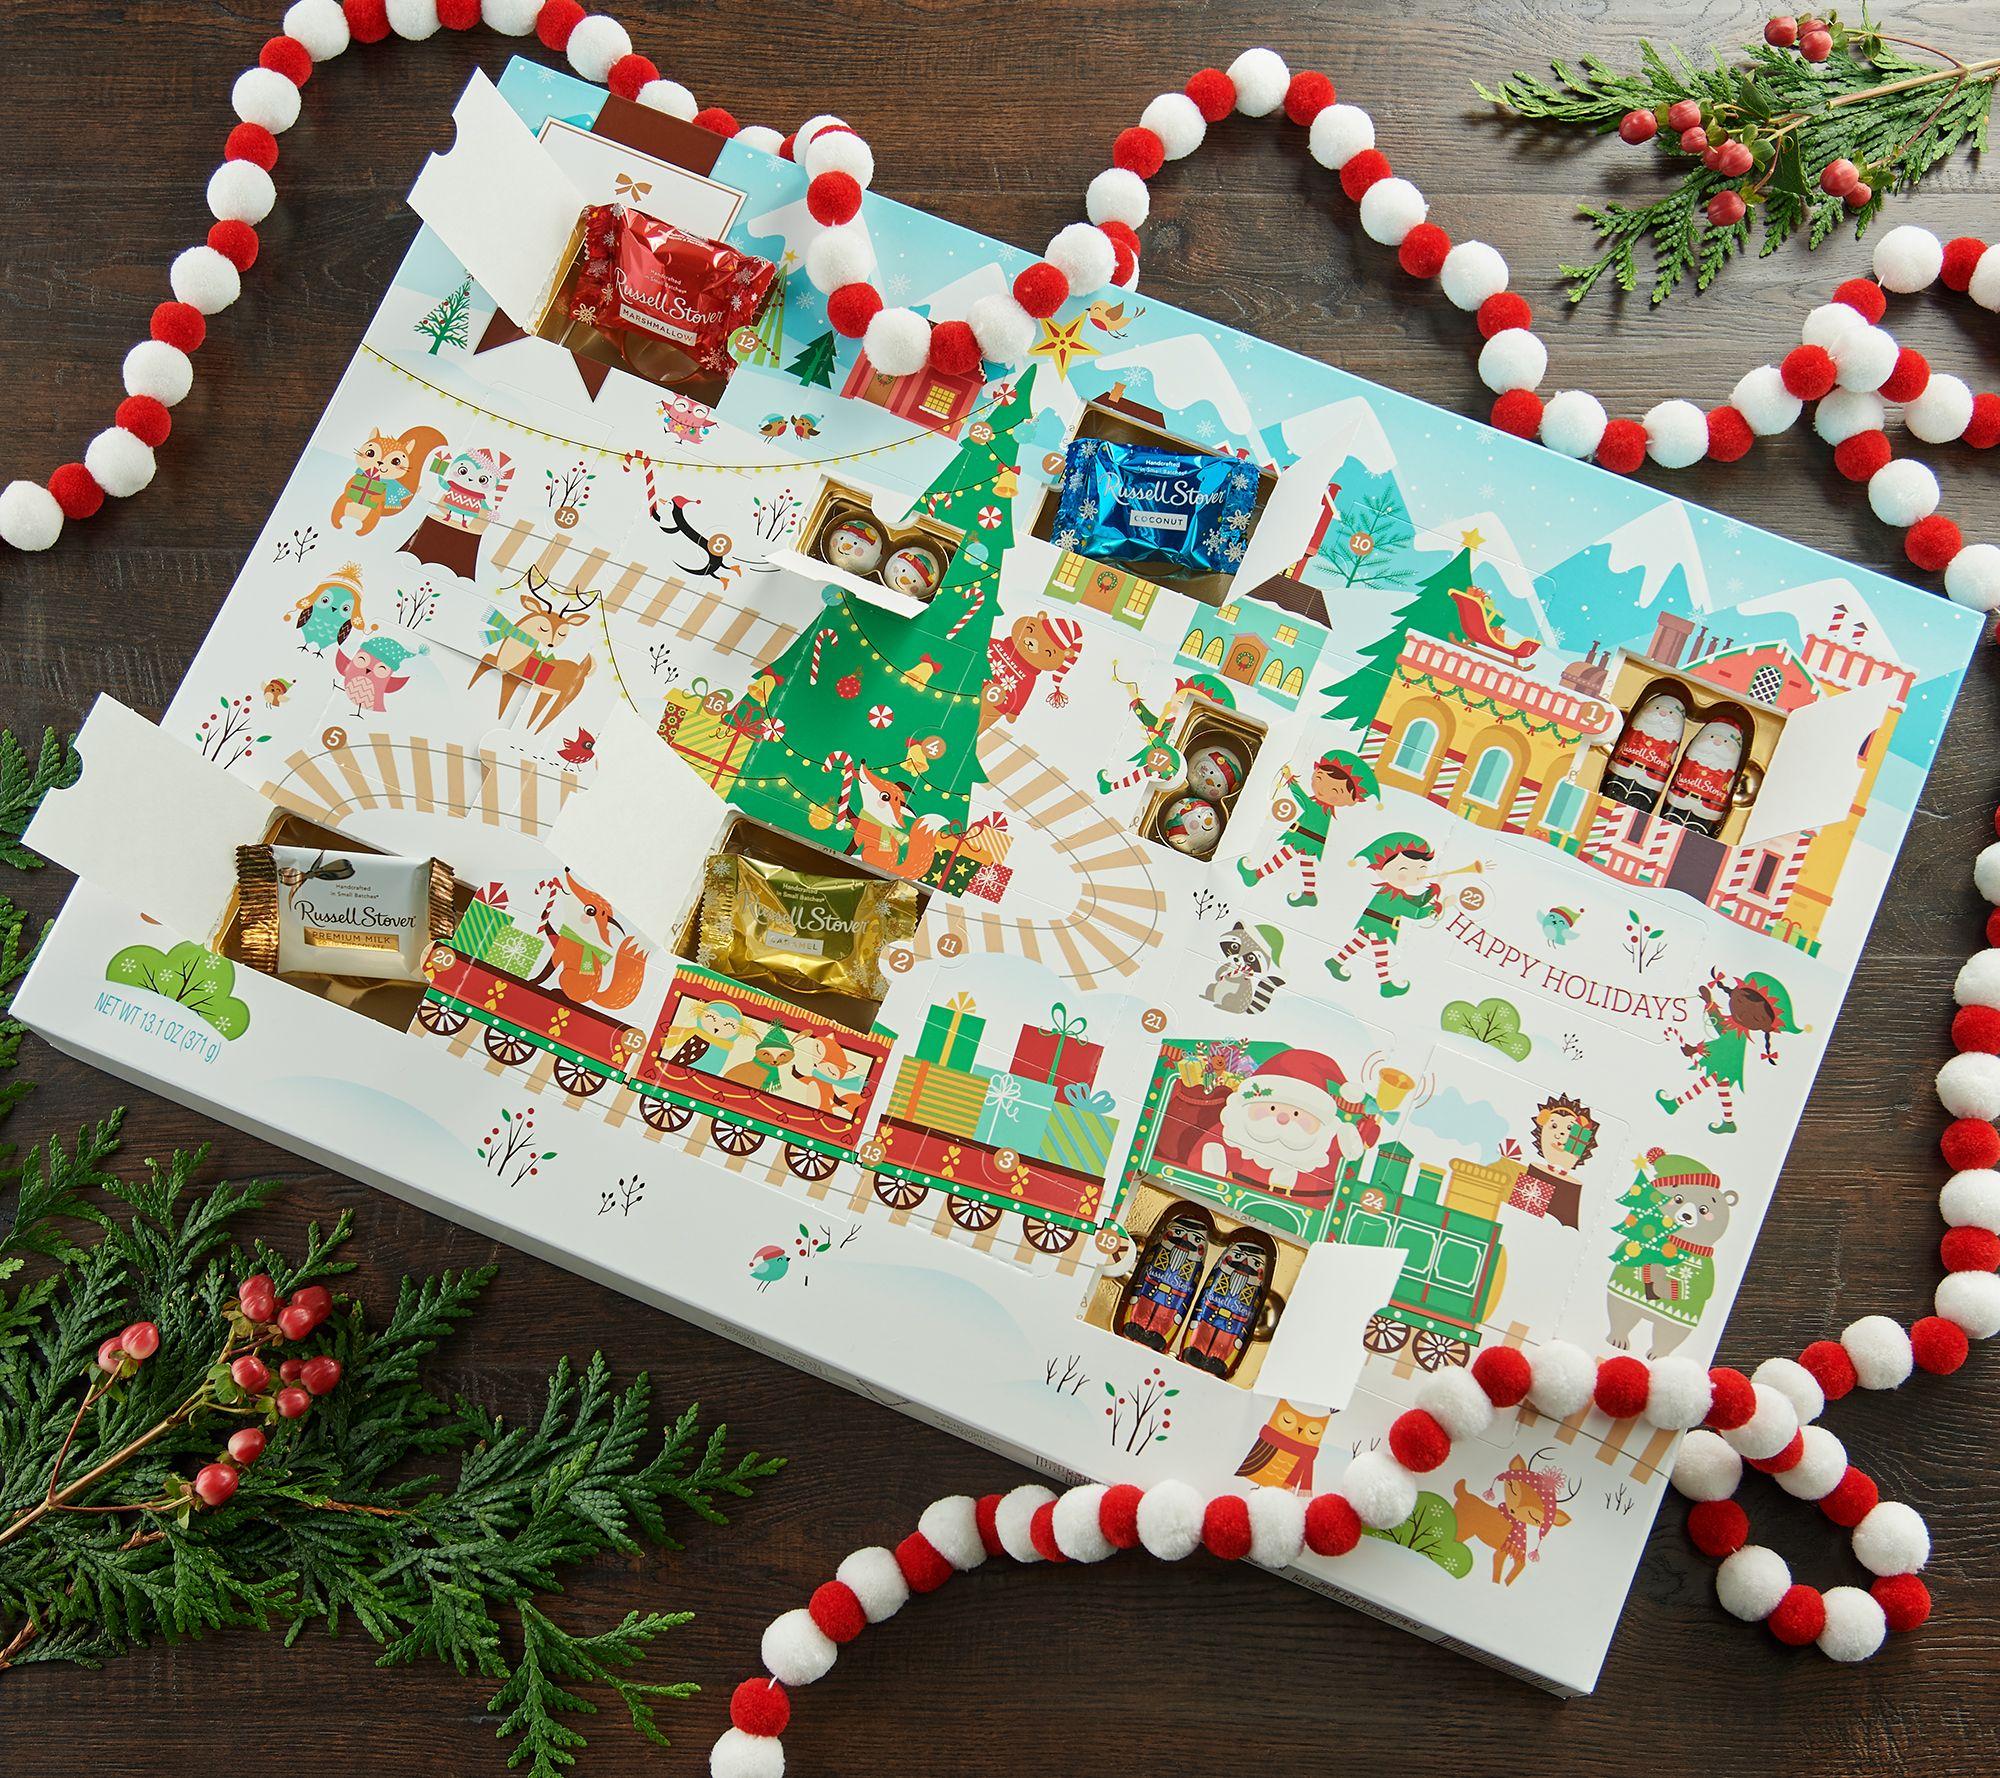 Russell Stover Assorted Novelties Advent Calendar - QVC.com